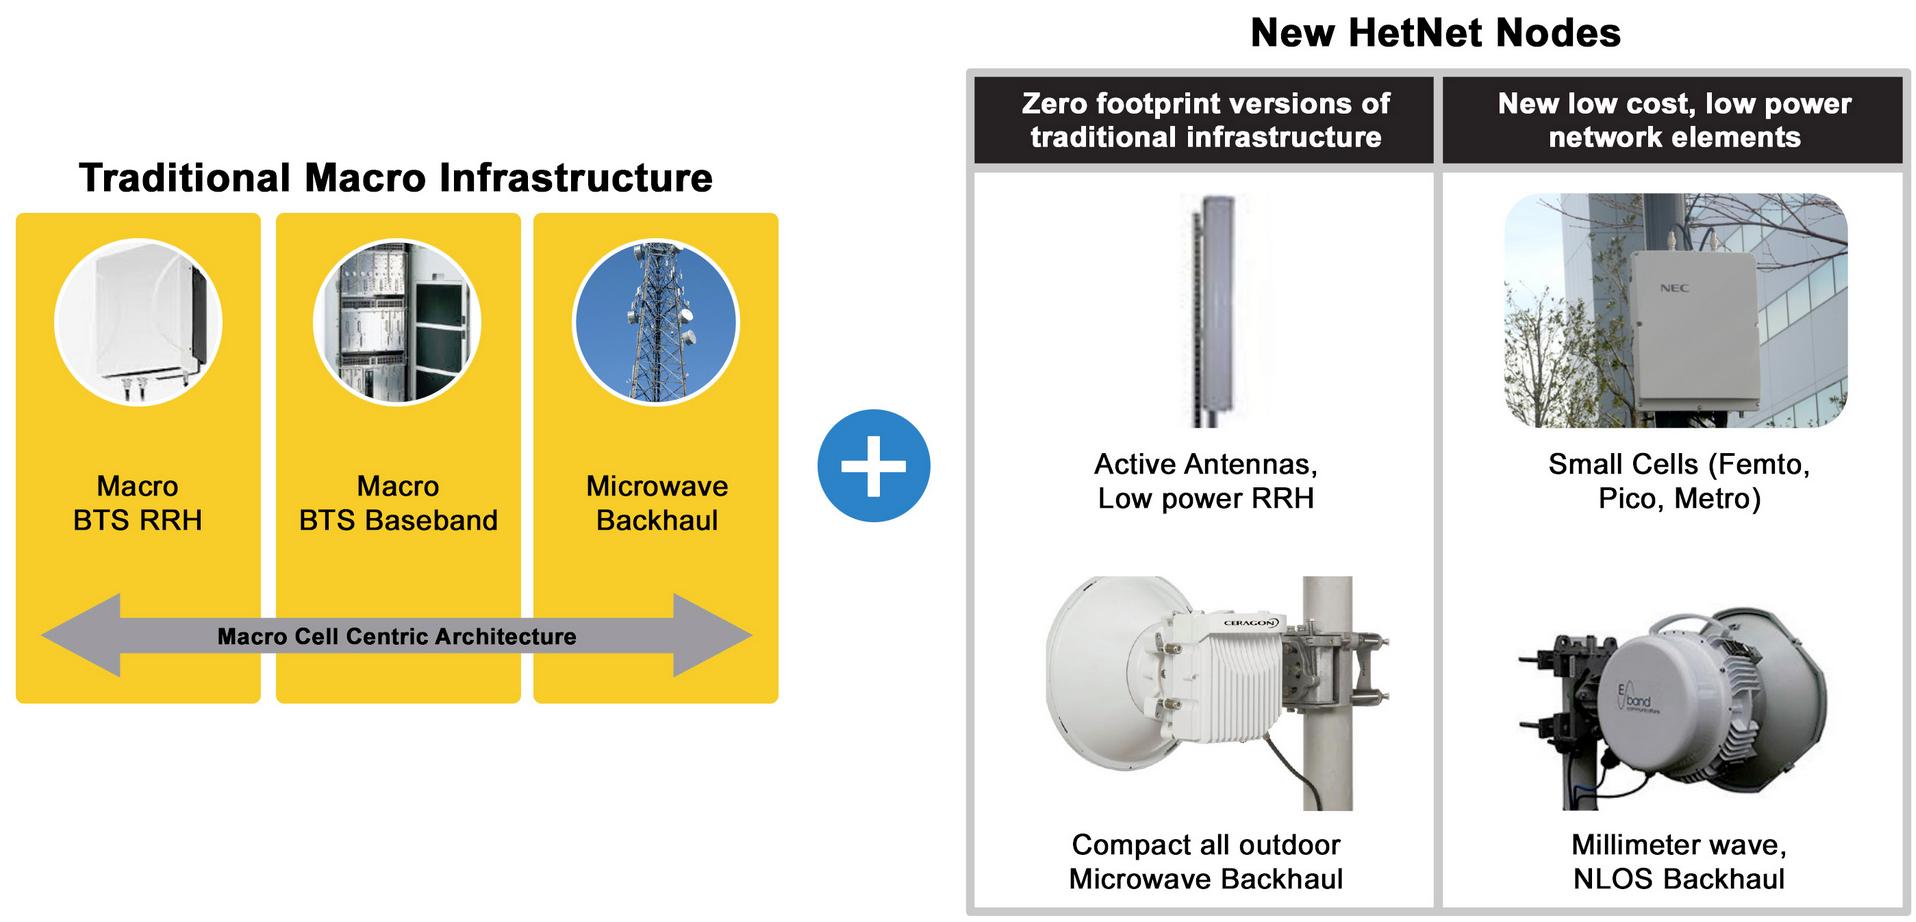 Evaluating Serdes In Fpgas Block Diagram Of The Physical Coding Sublayer Pcs Ip Core Figure 1 Todays Evolving Wireless Heterogeneous Networks Hetnets Combine Zero Footprint Versions